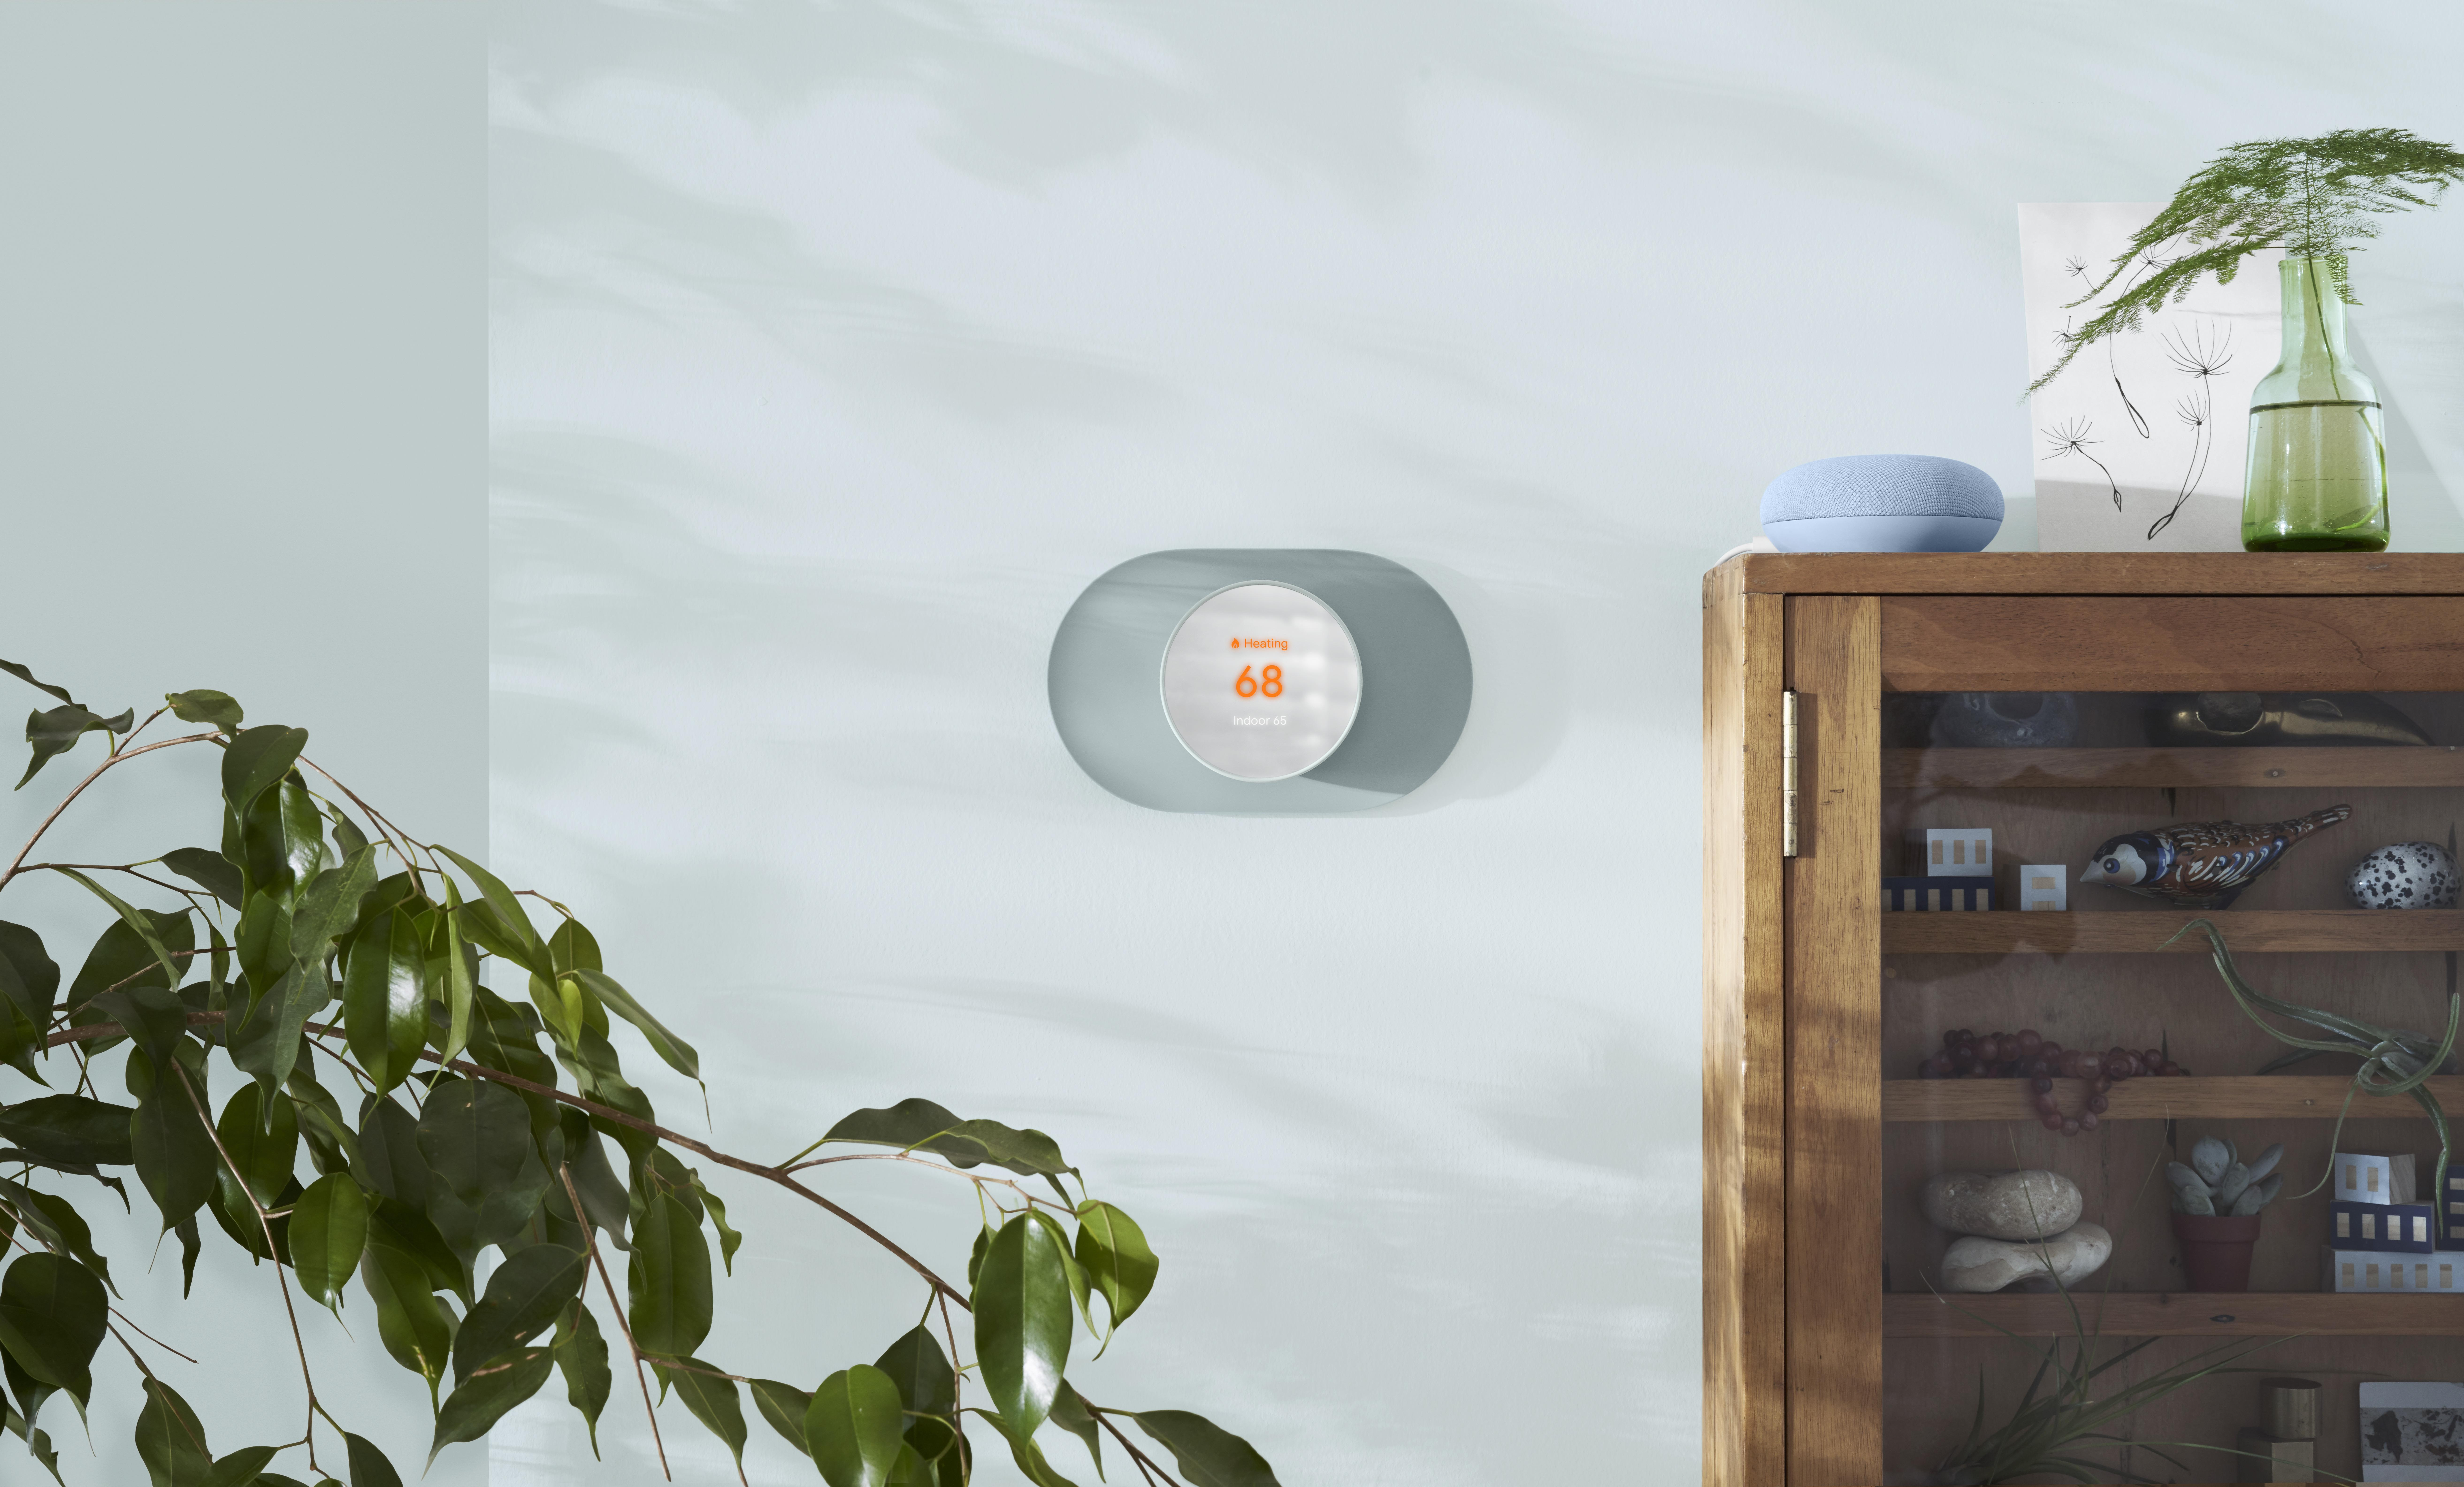 Google Announces New Nest Thermostat